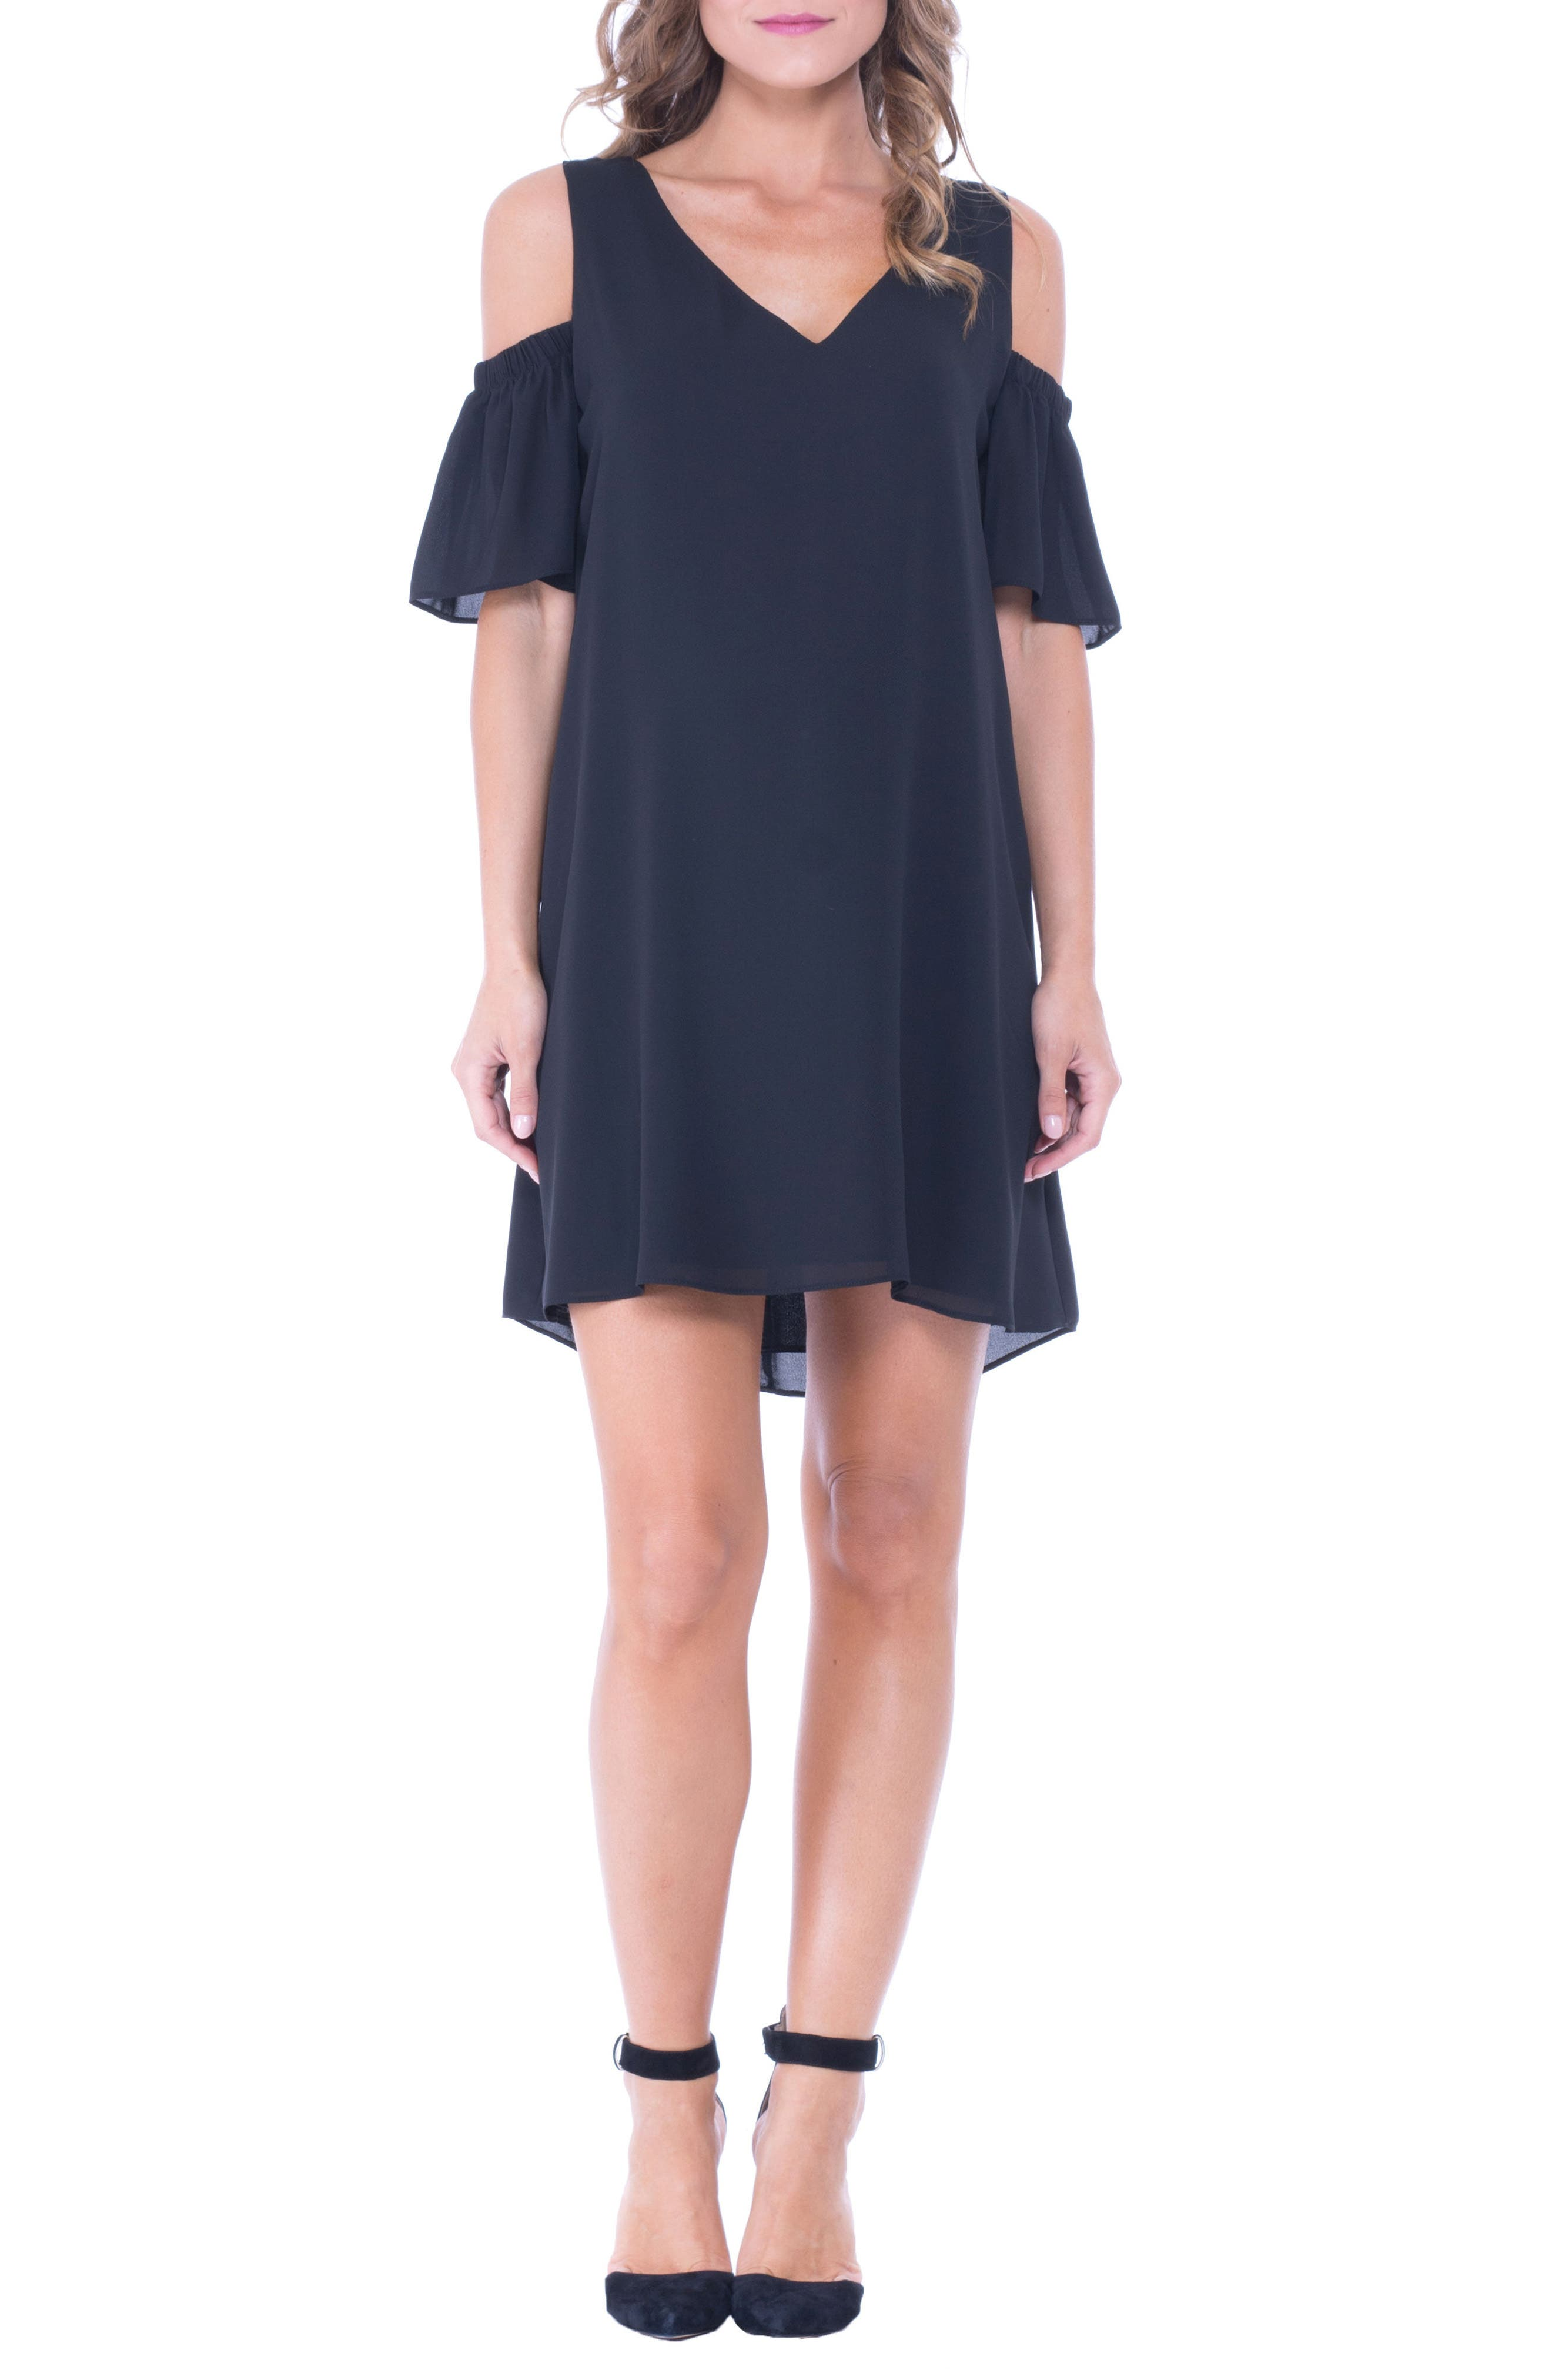 Olian Juliette Cold Shoulder Maternity Dress